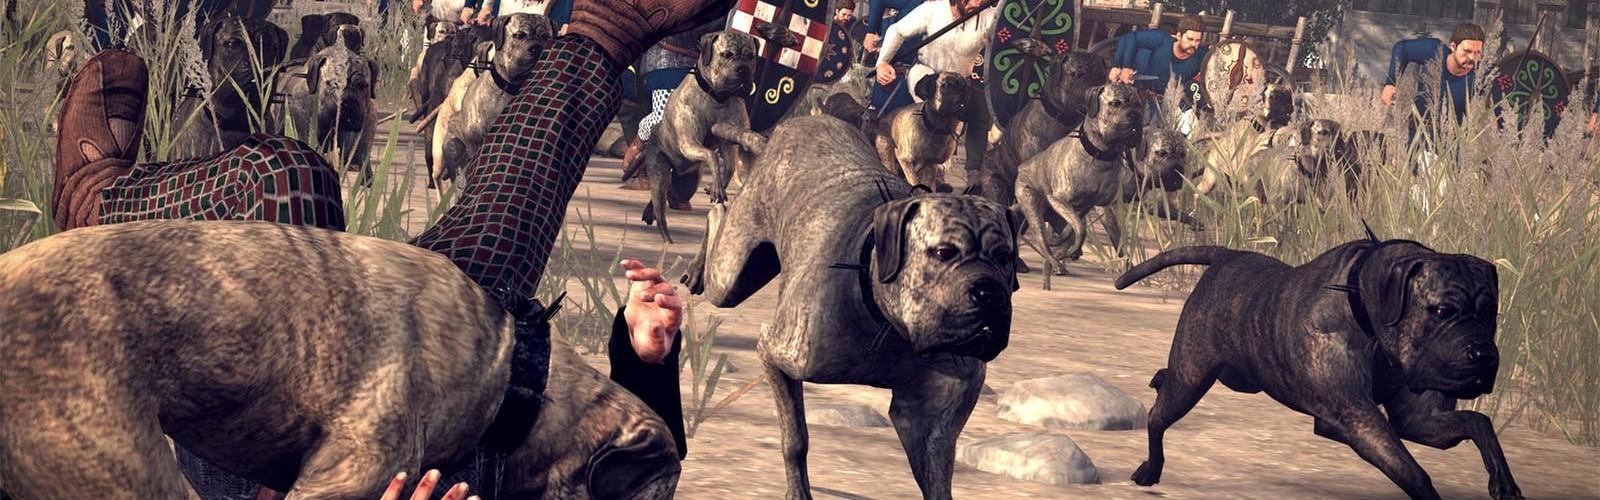 Total War: ROME II - Beasts of War (DLC) Steam Key EUROPE